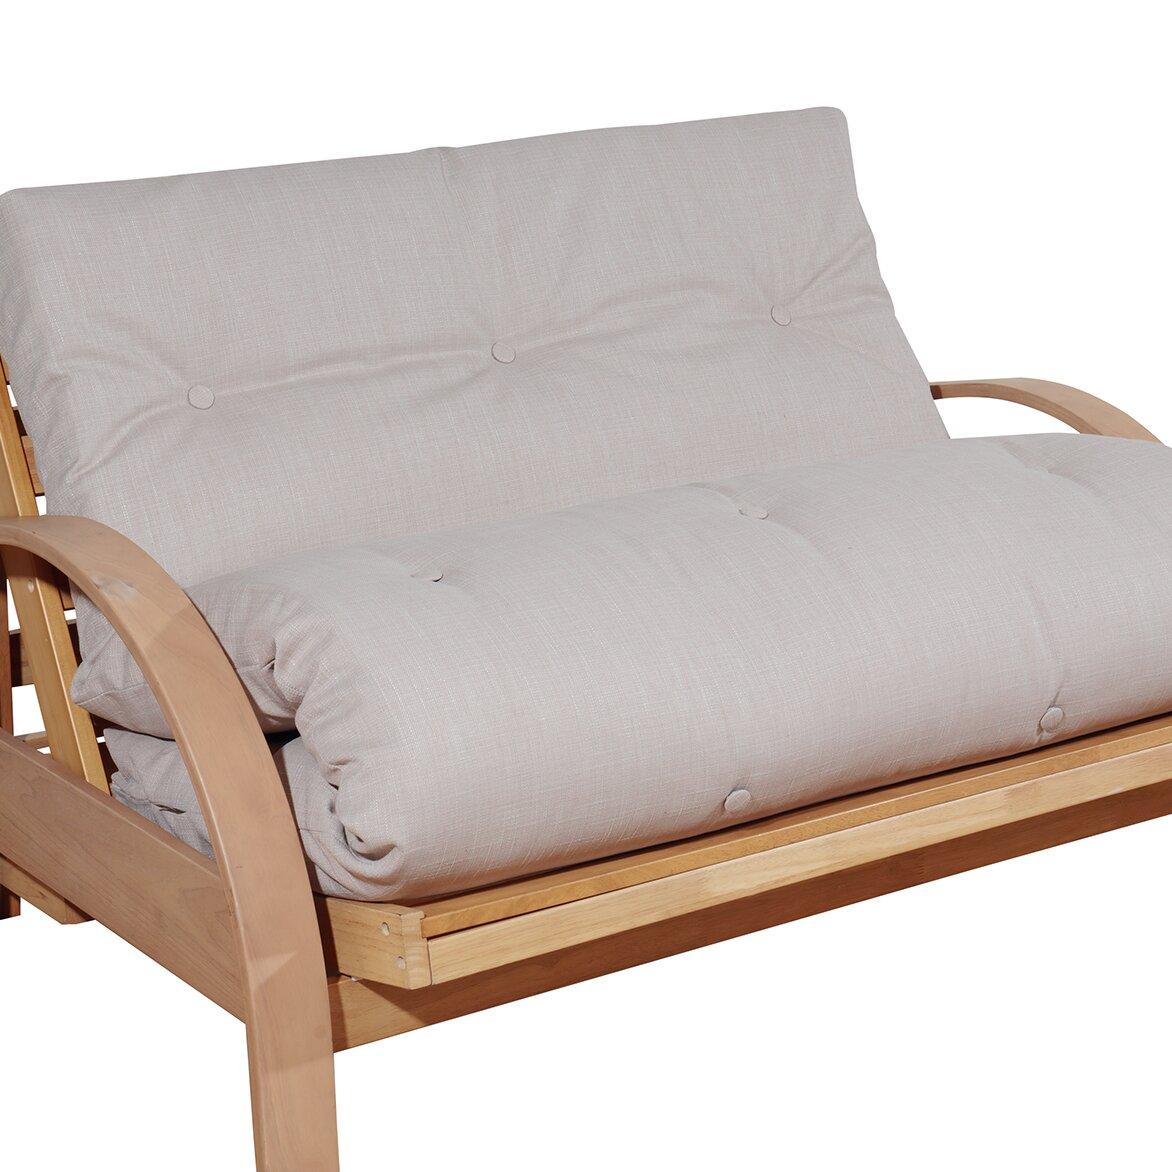 Futon Company Reviews Furniture